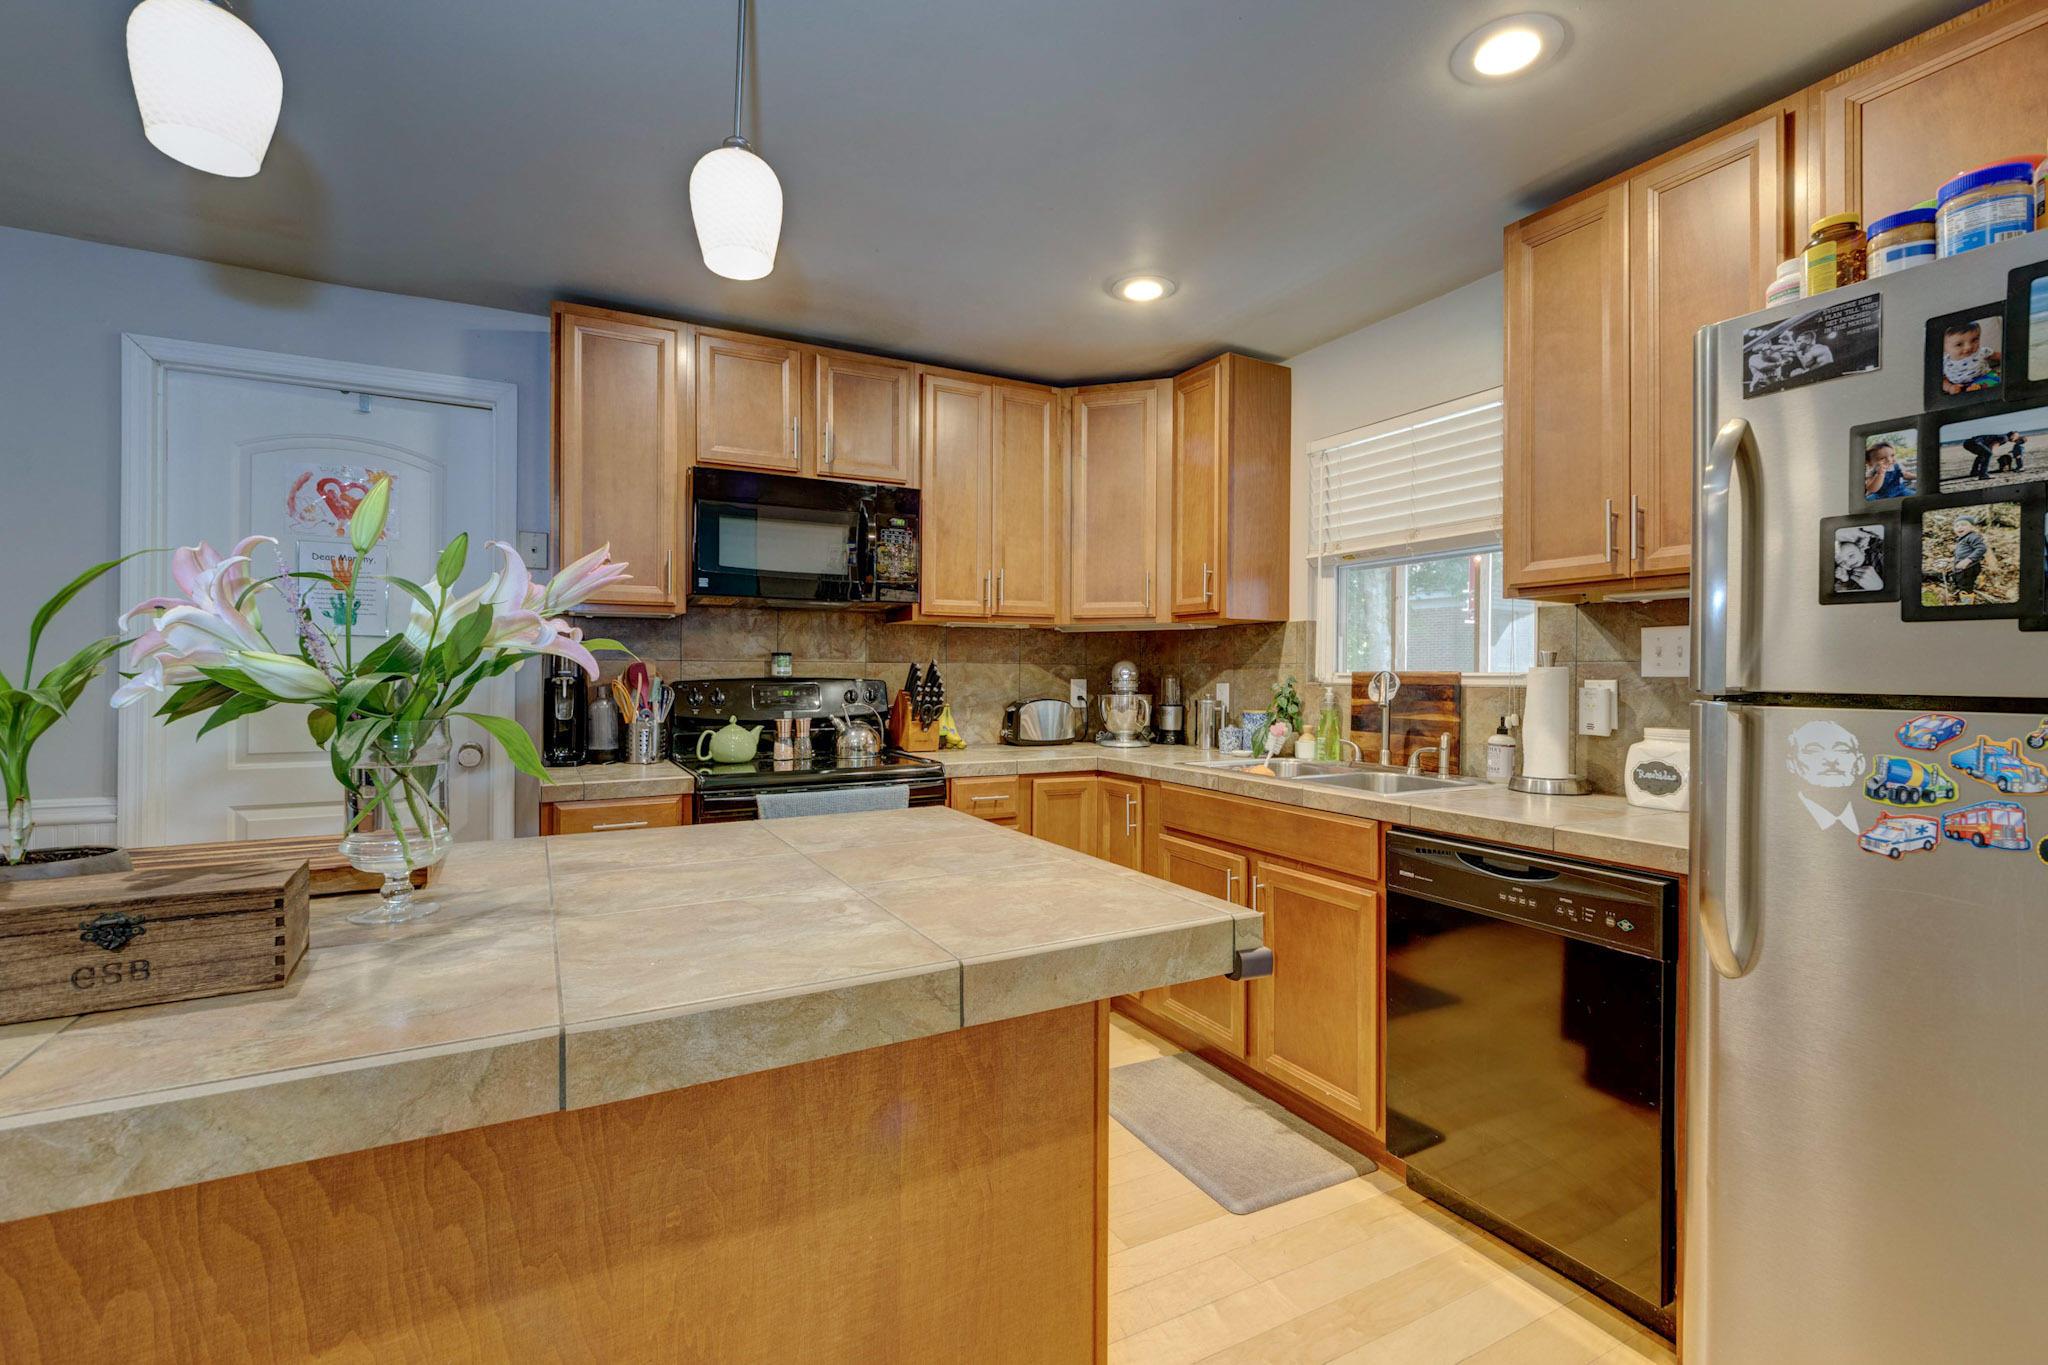 St Andrews Homes For Sale - 1808 2nd, Charleston, SC - 11